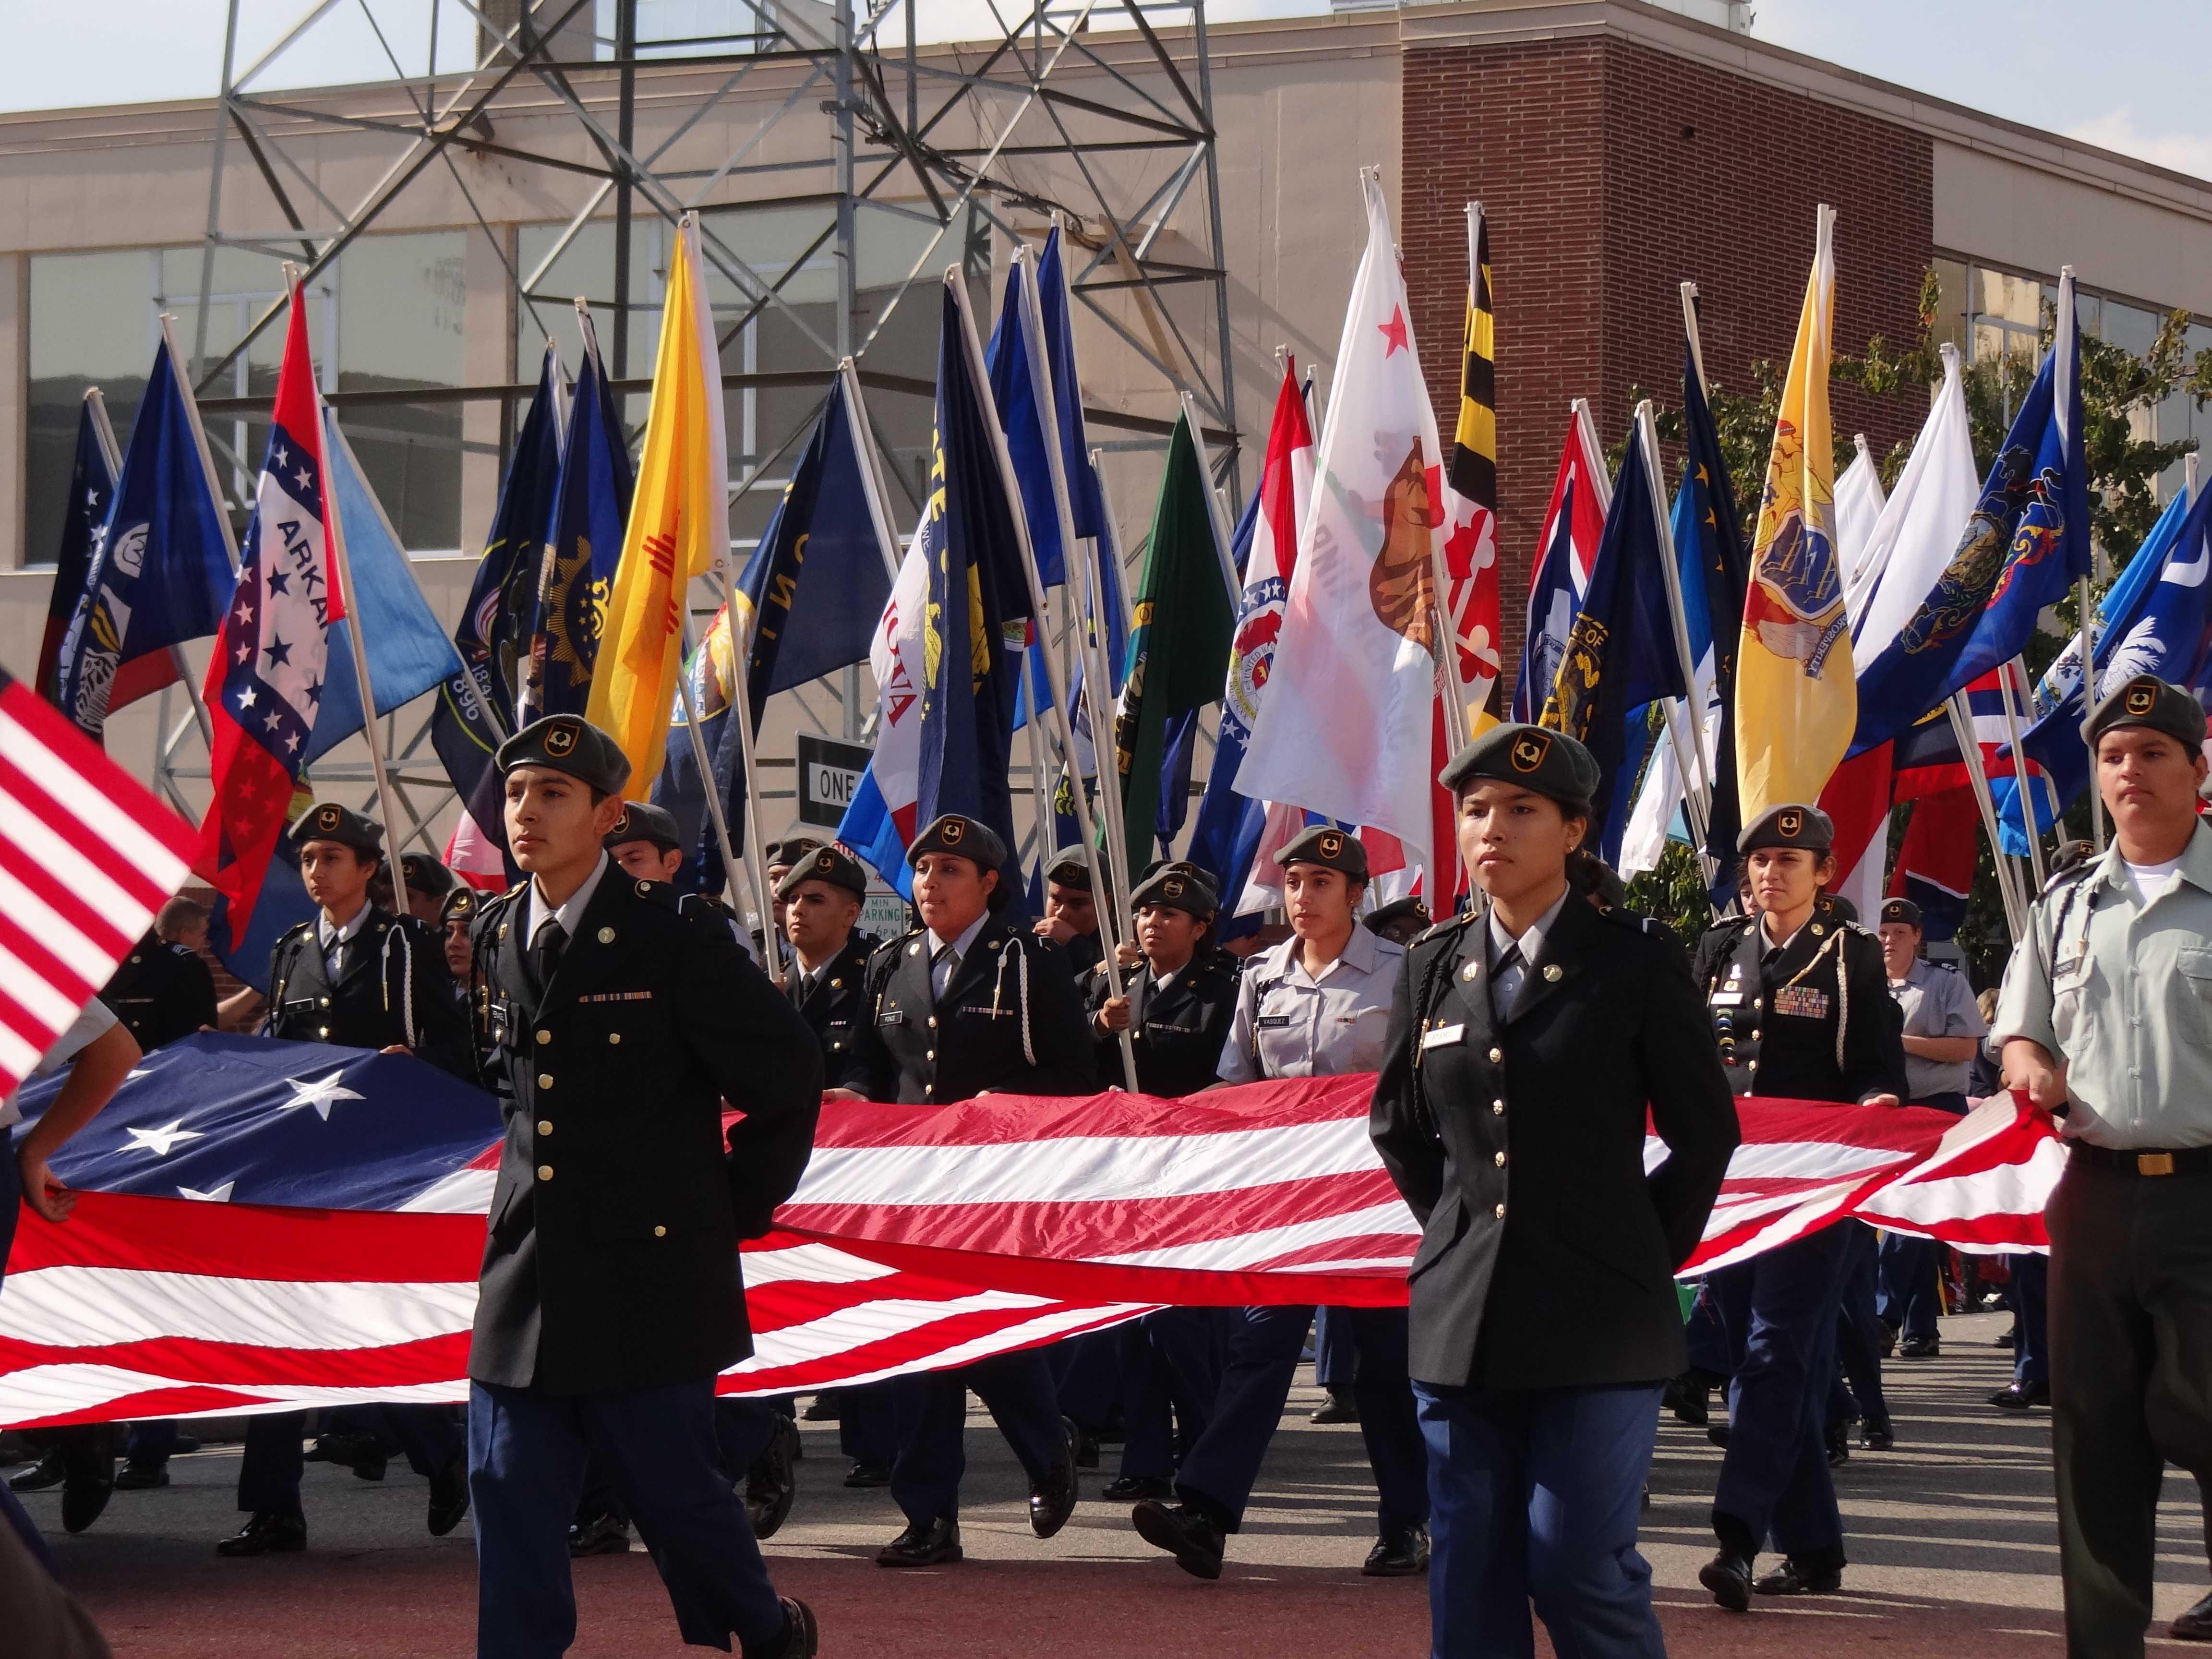 Parade honors service members